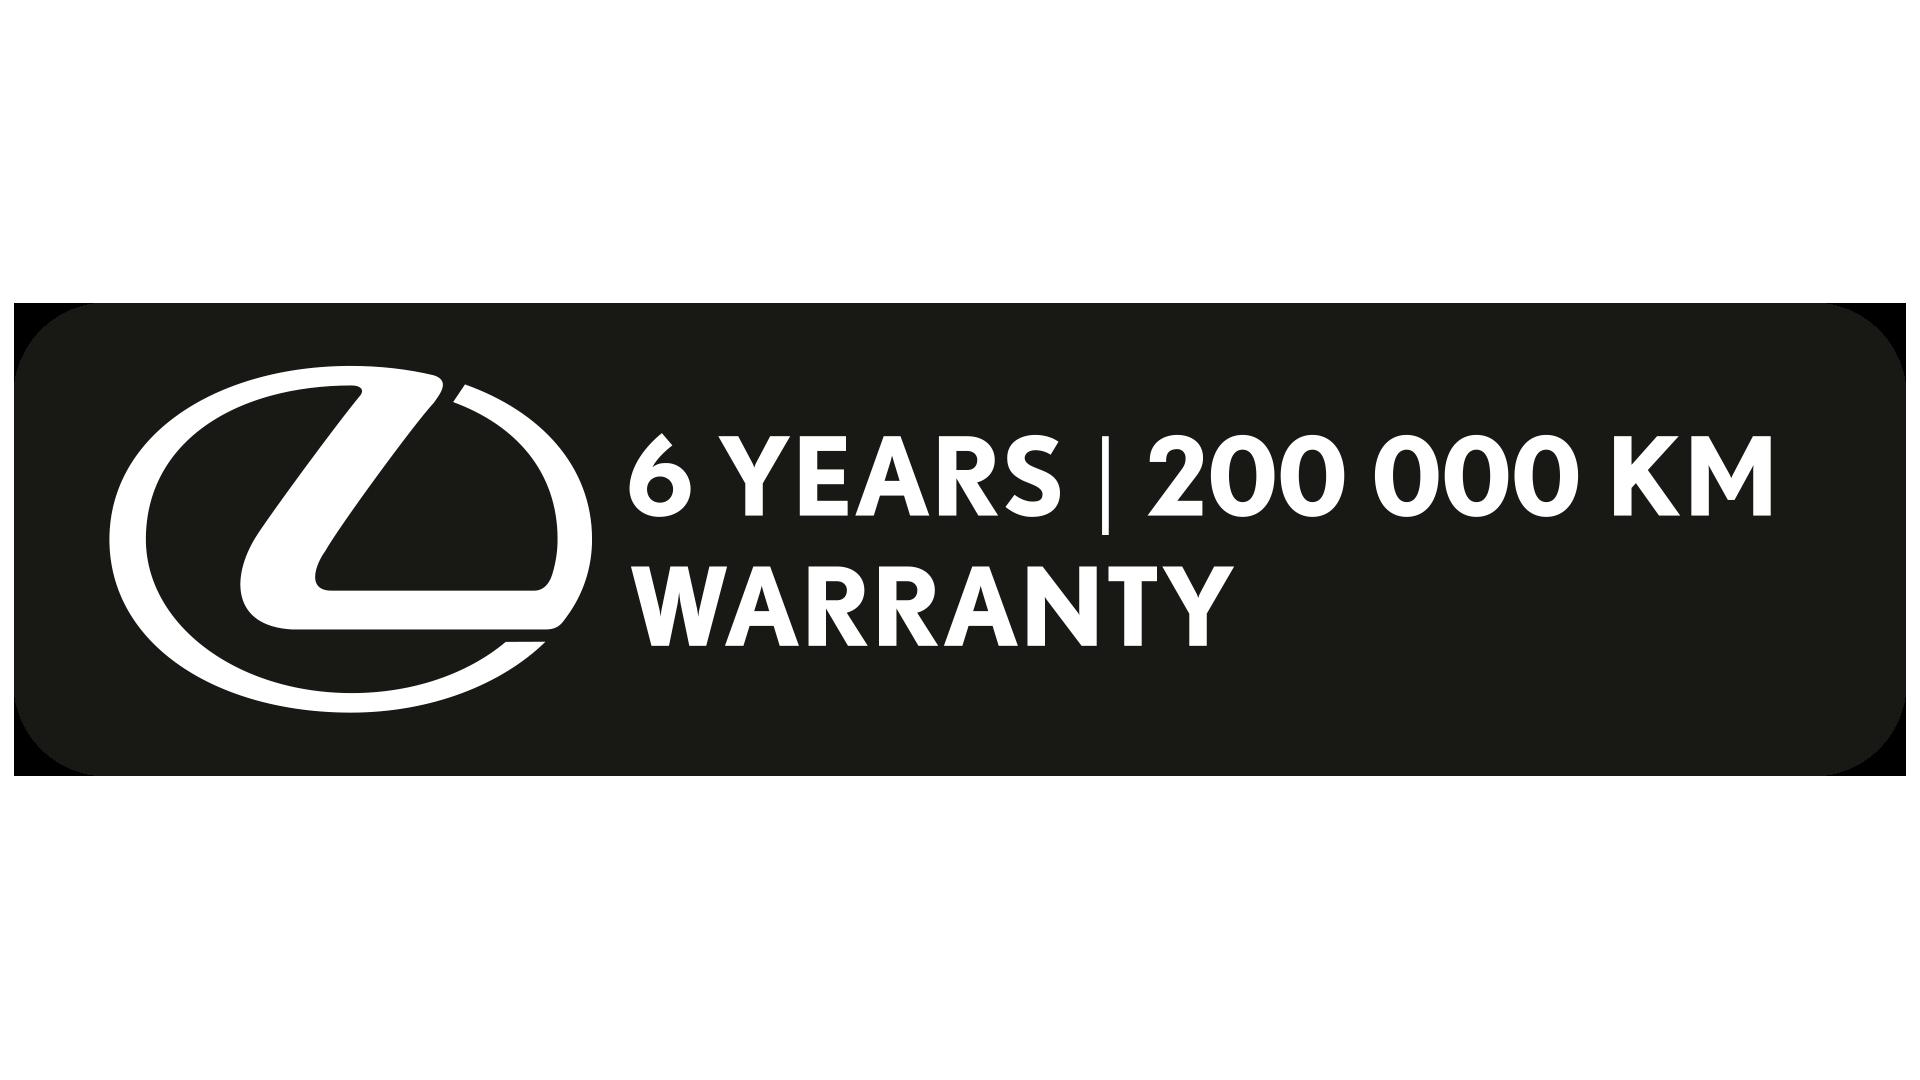 Lexus 200km years logo image